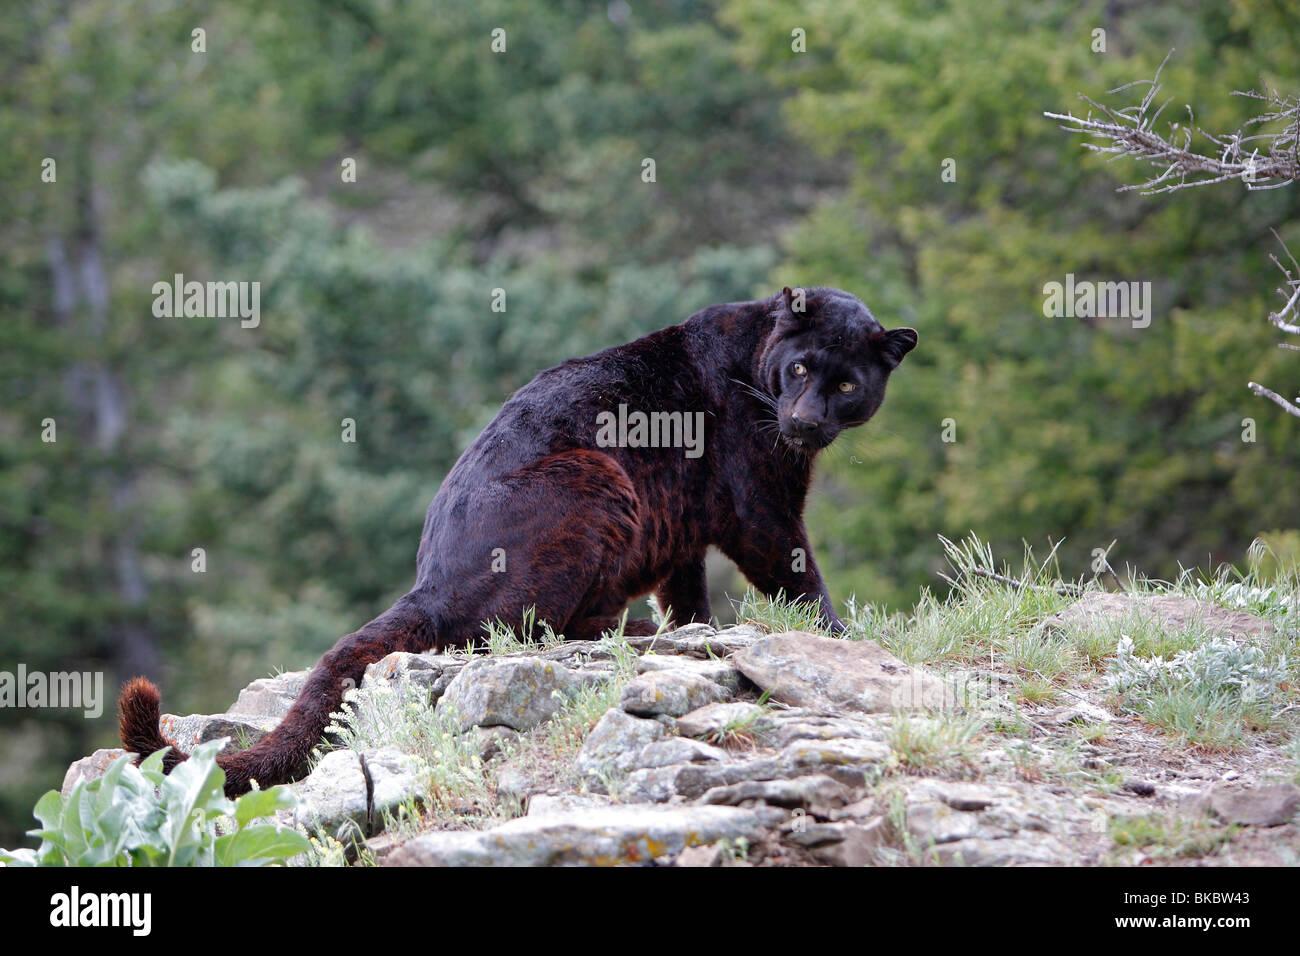 black panther panthera pardus stockfotos black panther panthera pardus bilder alamy. Black Bedroom Furniture Sets. Home Design Ideas